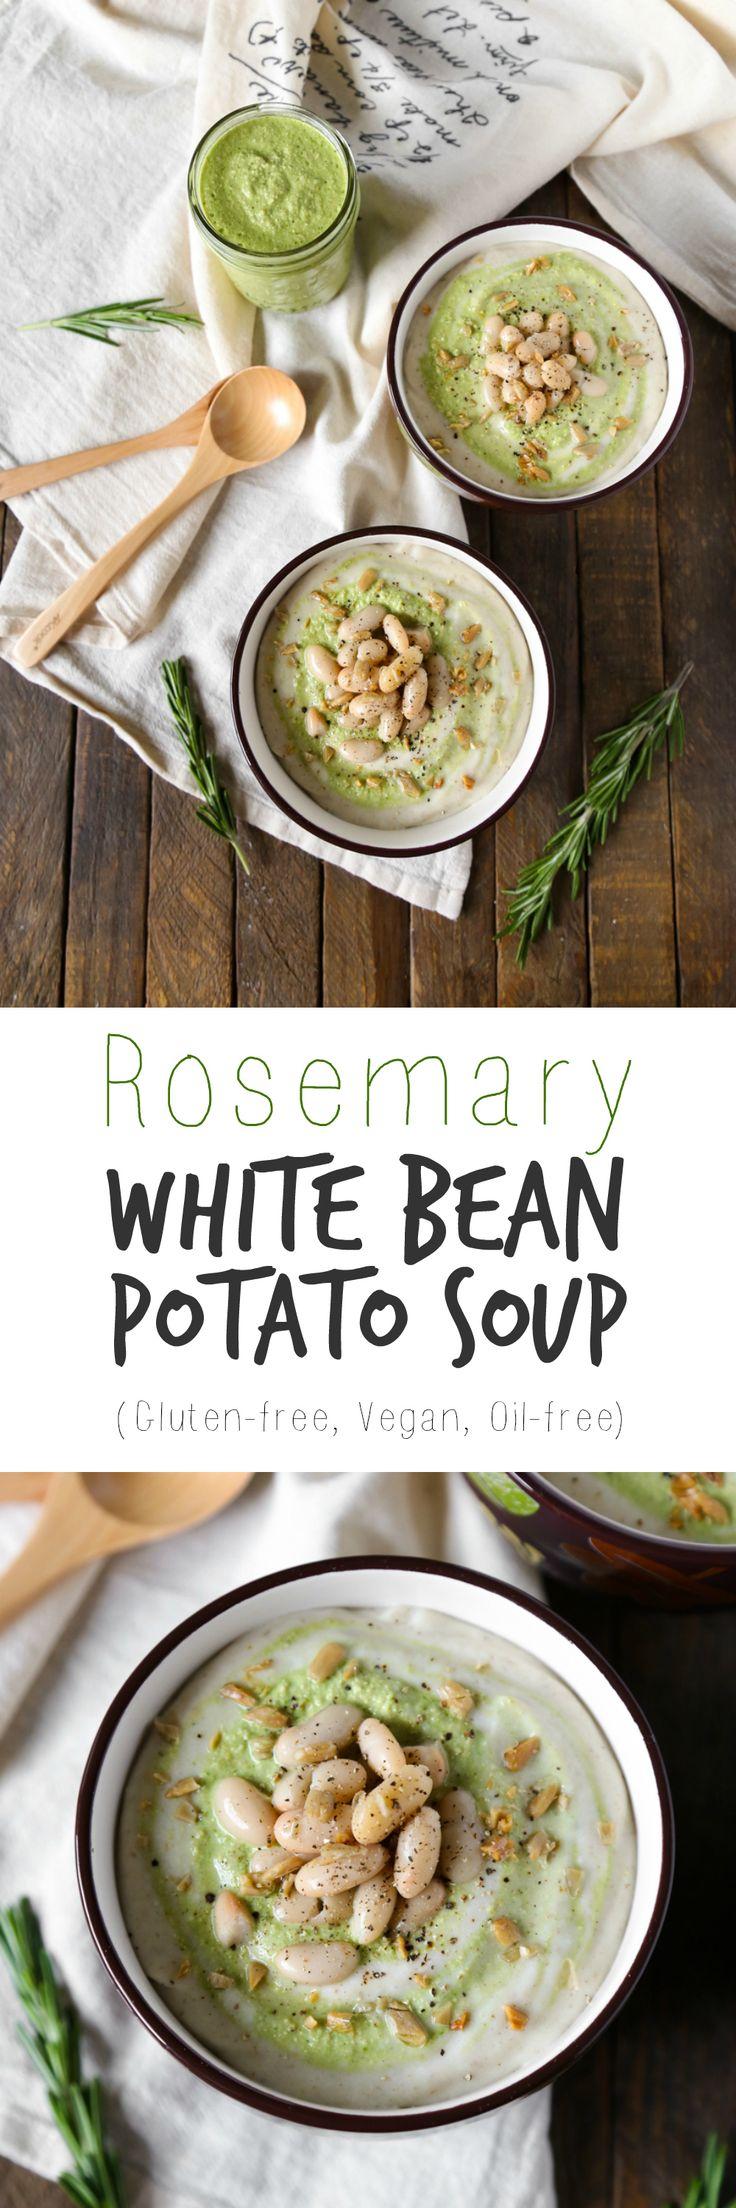 Rosemary White Bean & Potato Soup | Gluten-free, Vegan, Oil-free | The Plant Philosophy